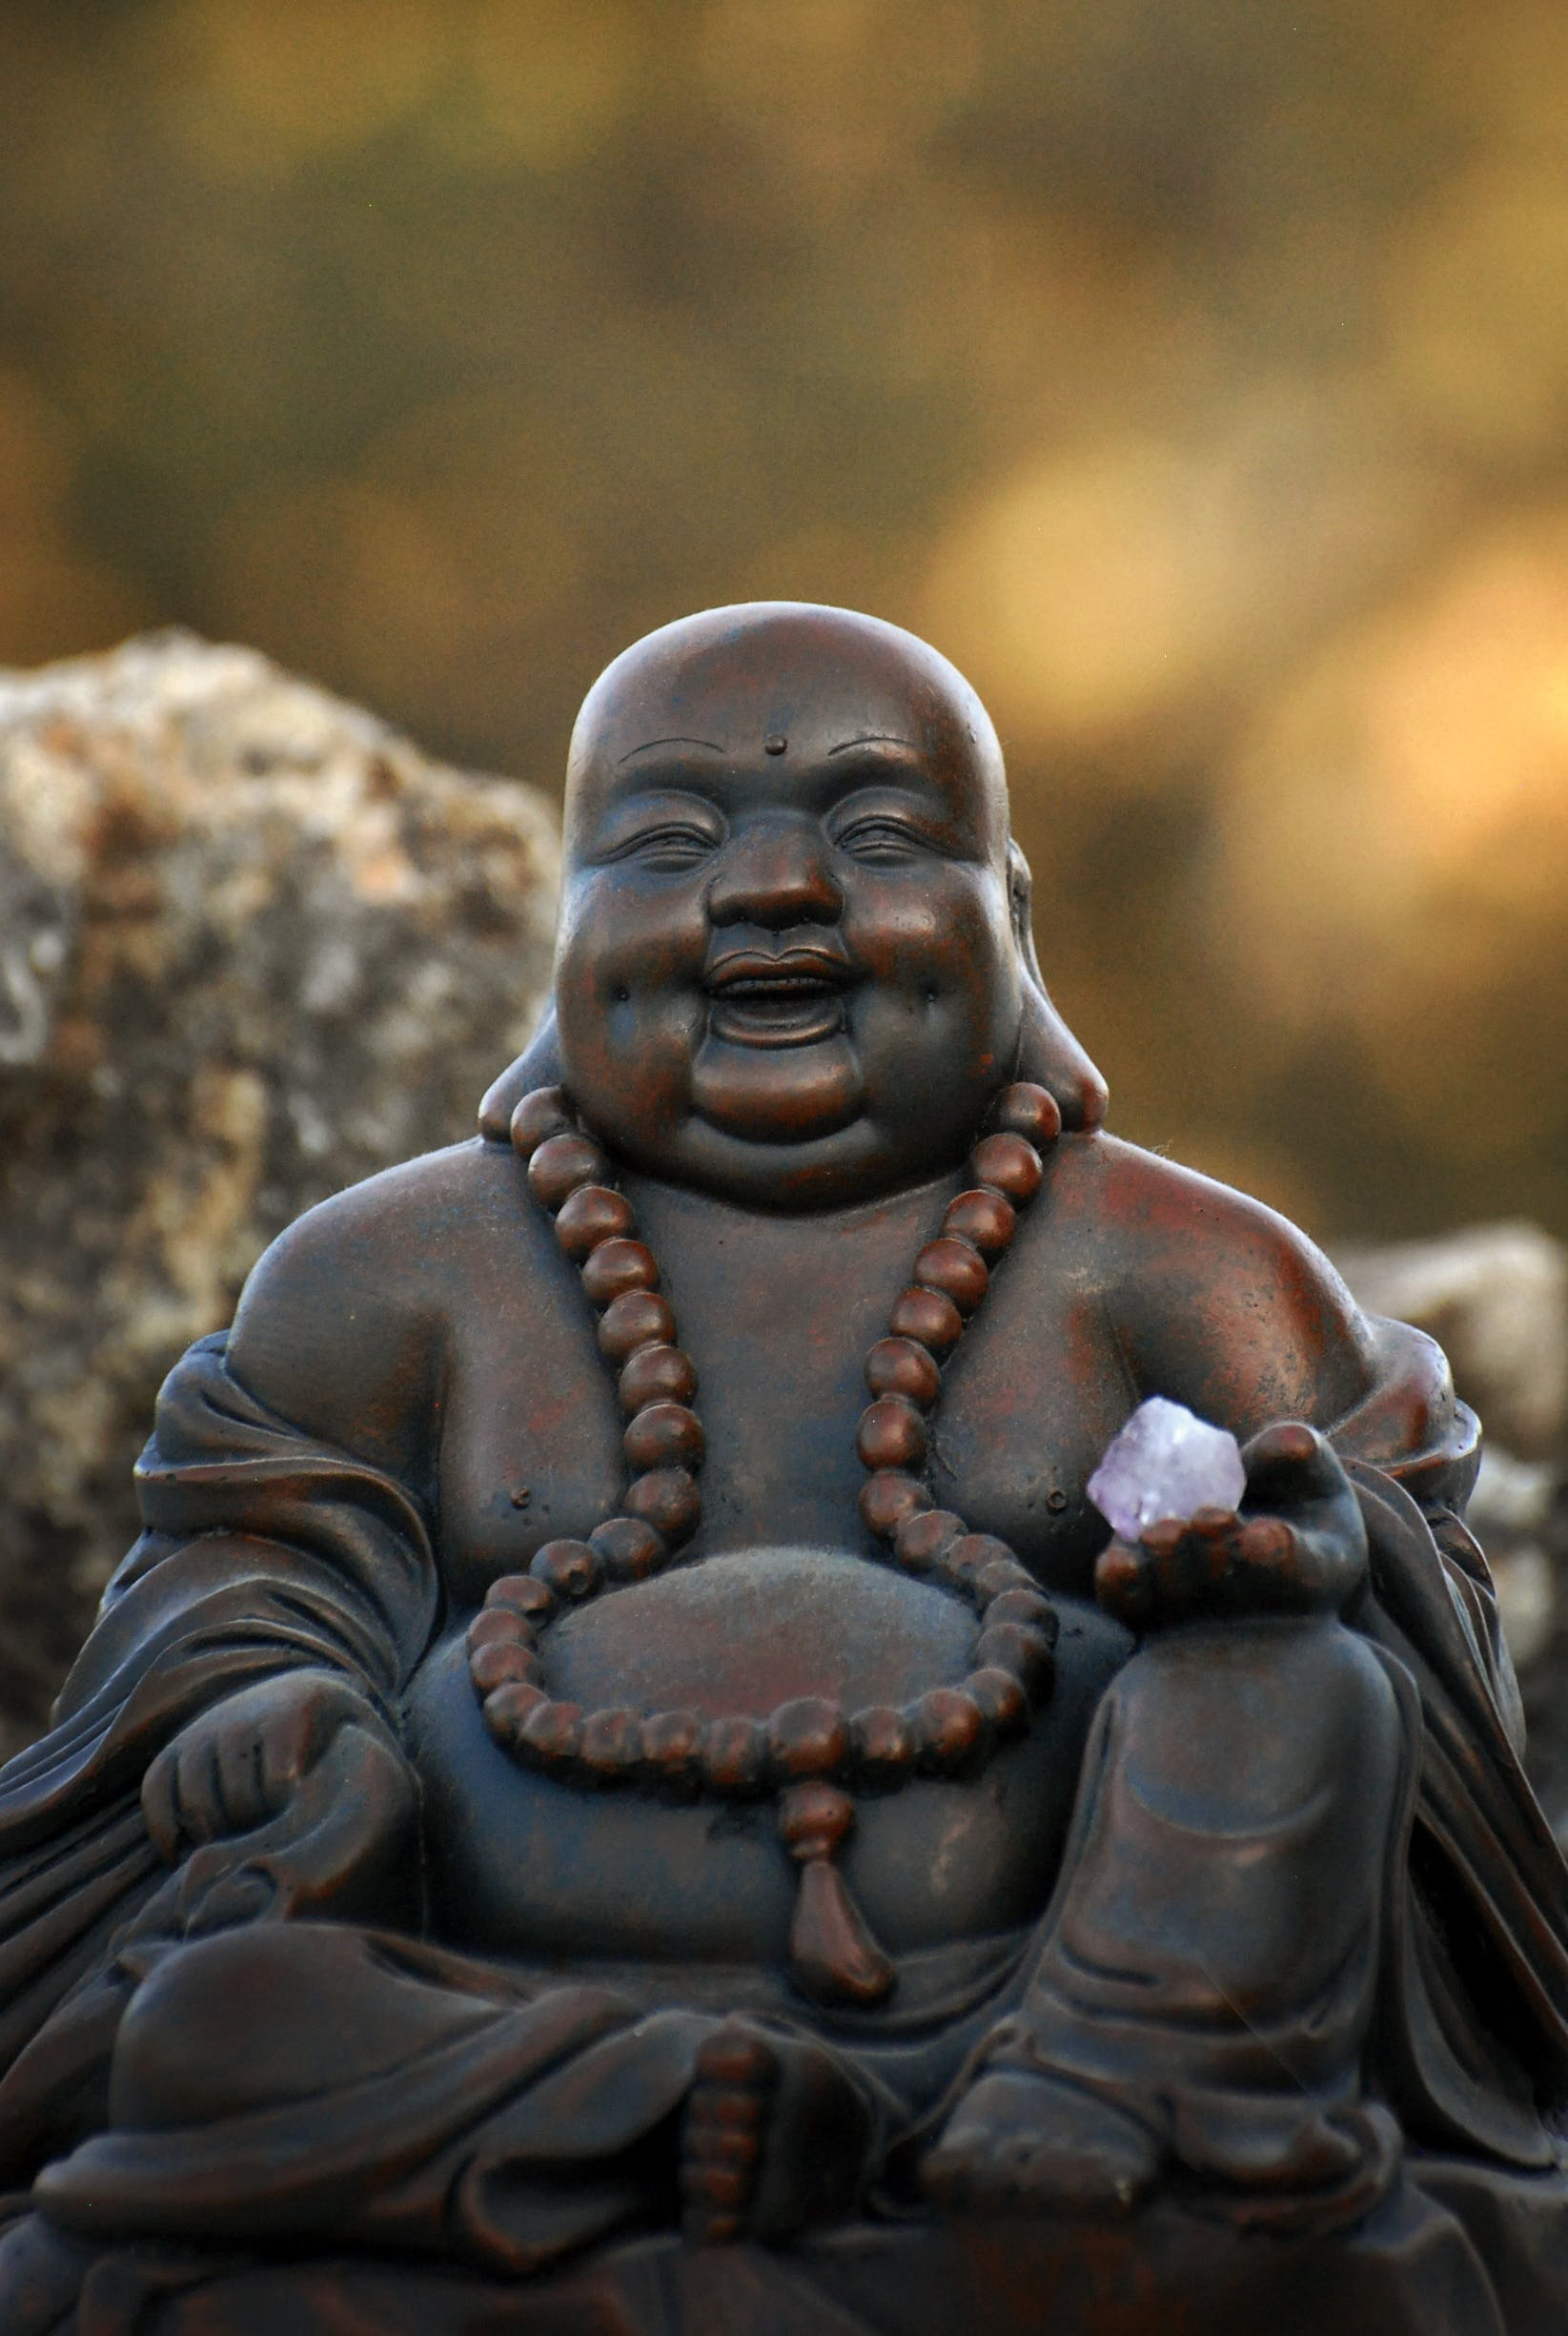 Free stock photo of reflection, statue, yoga, religion